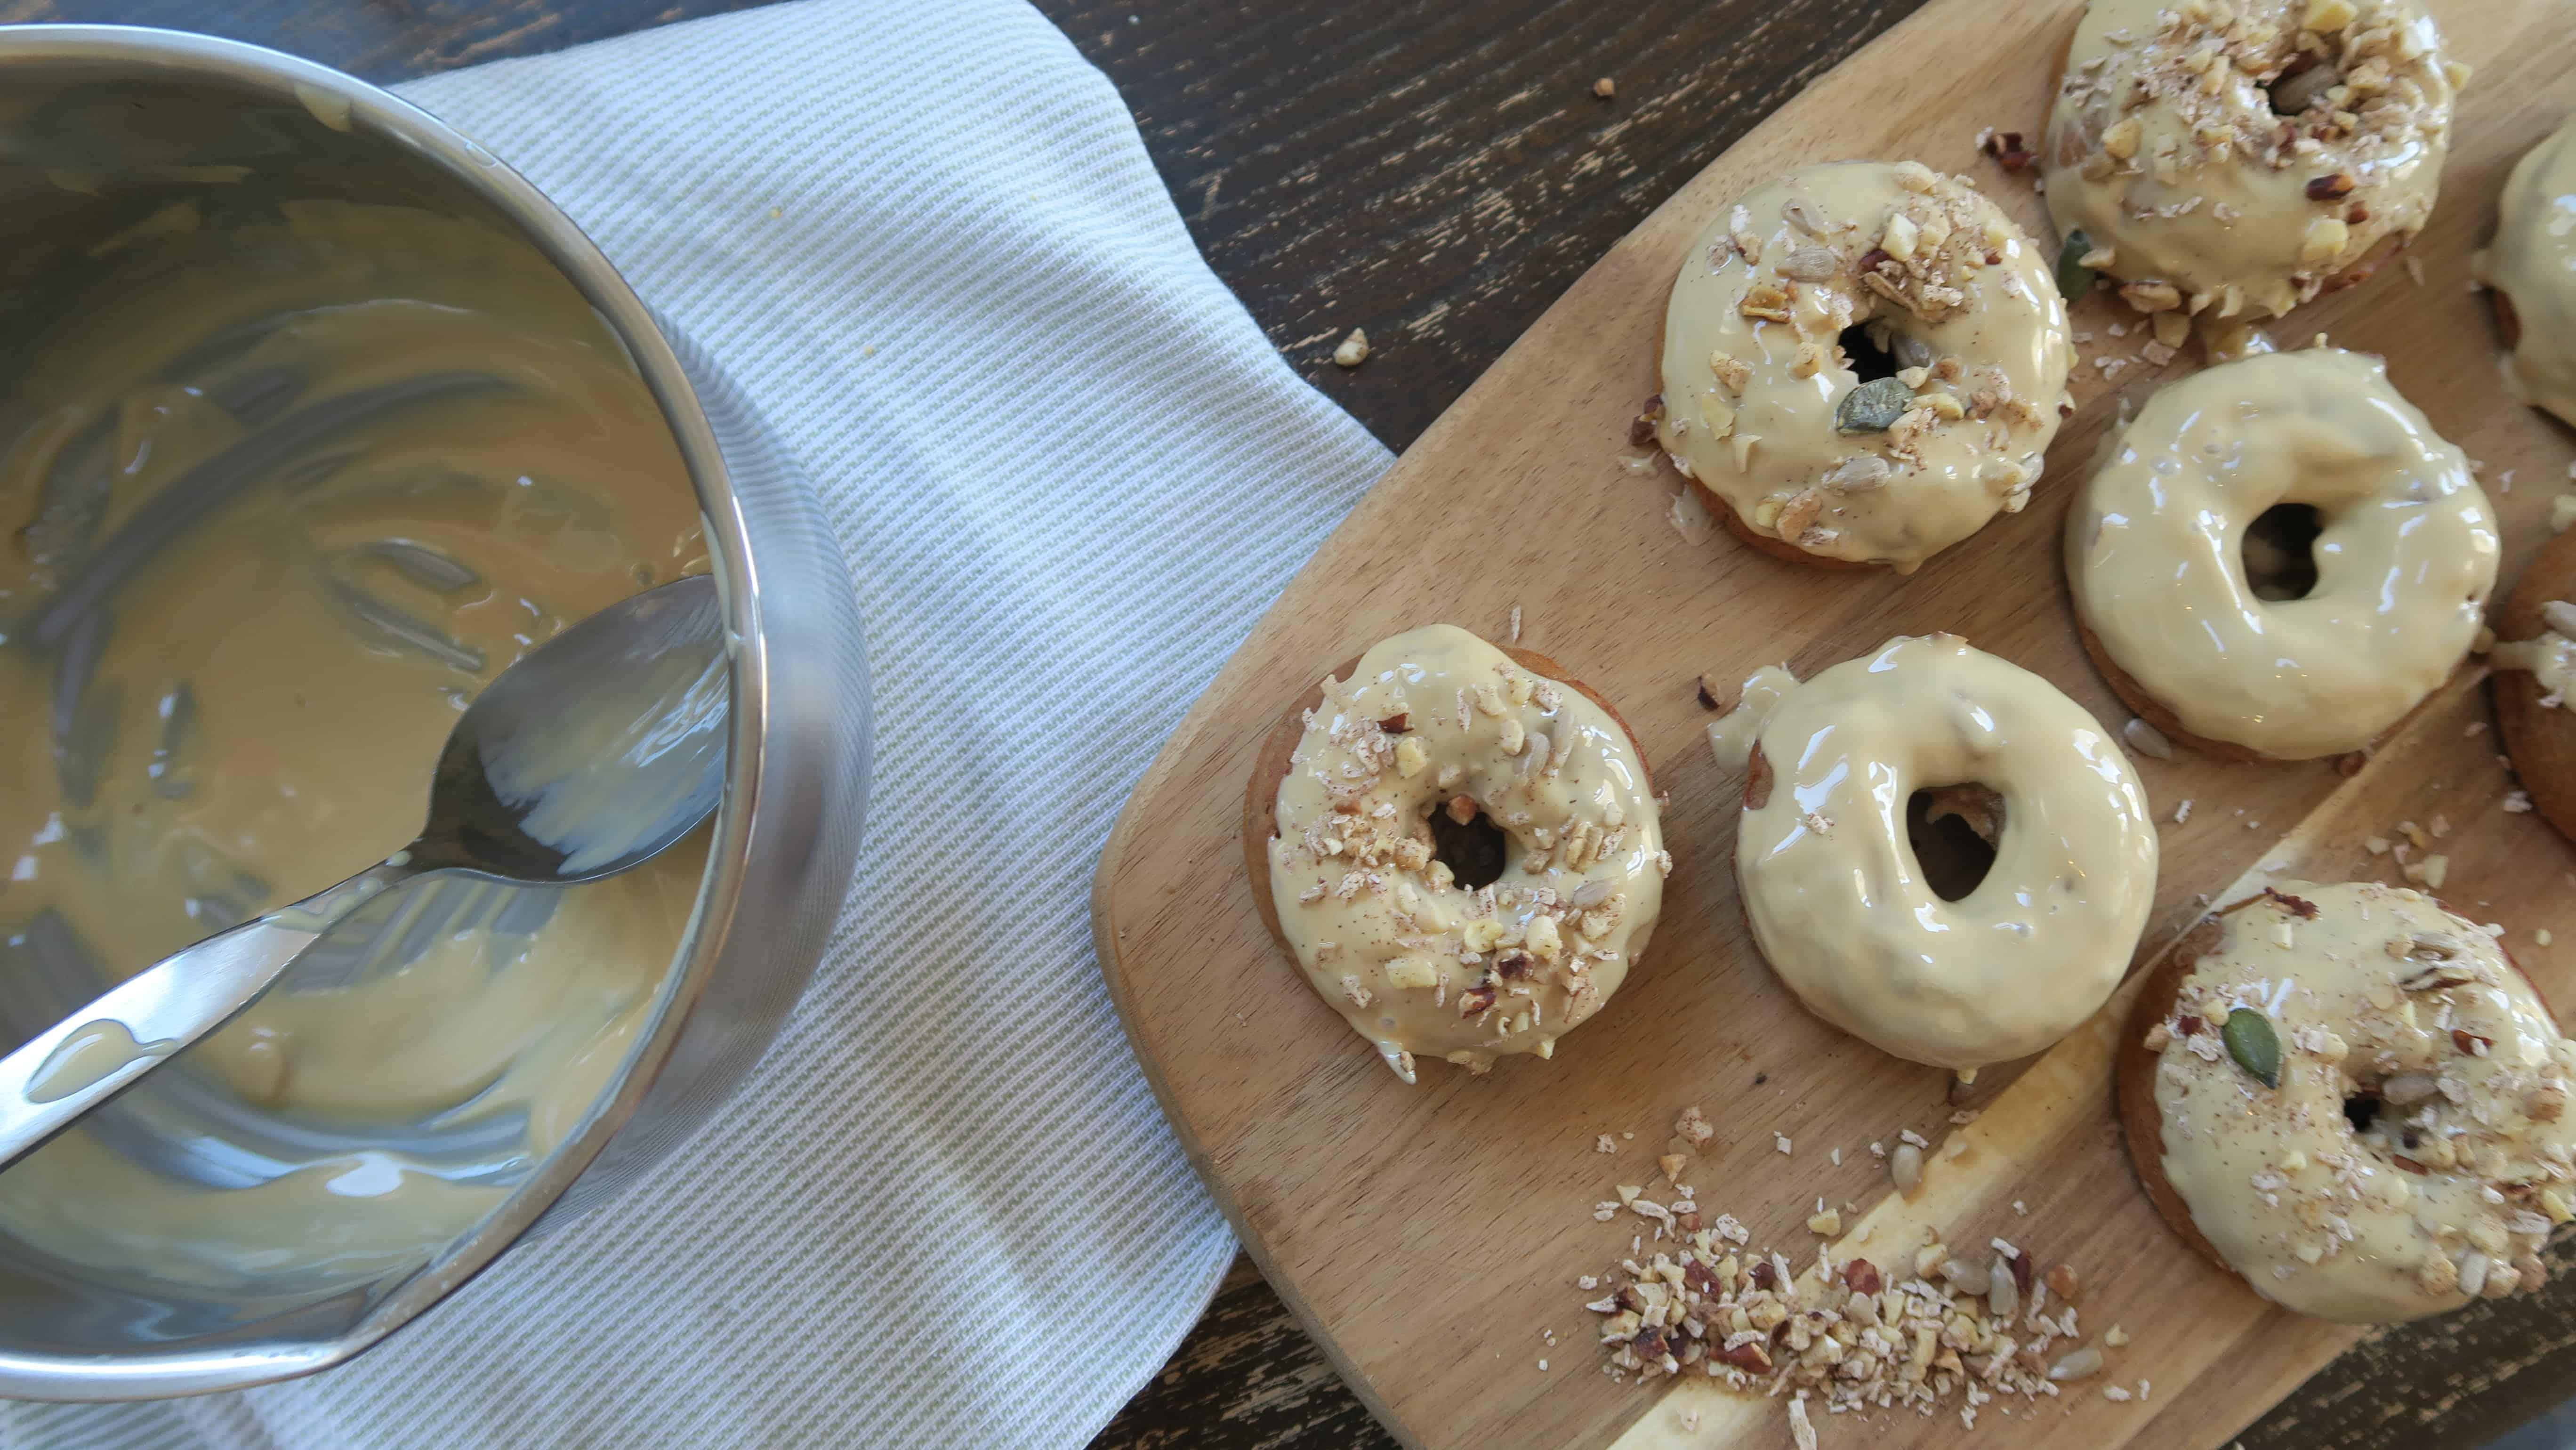 Gluten free dairy free egg free vegan banana bread doughnuts recipe with caramac topping